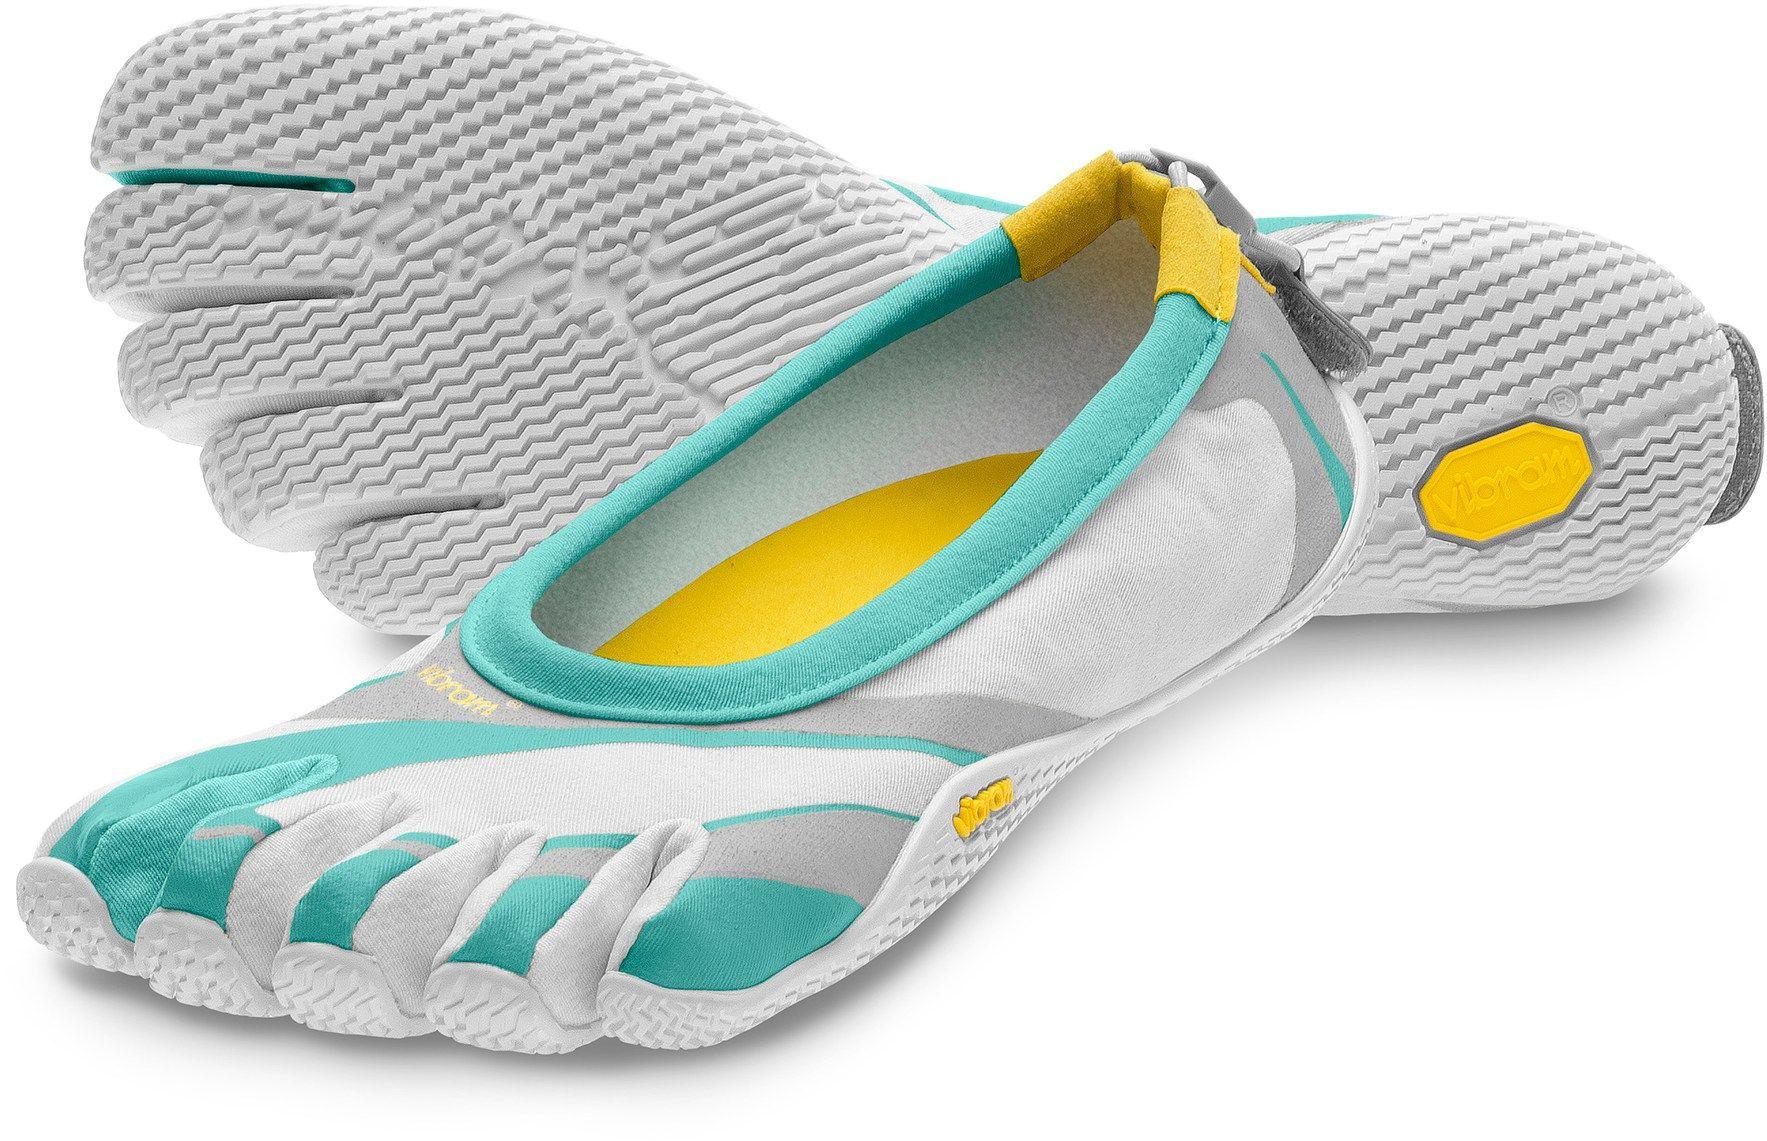 100% authentic bae40 b87c6 ... low price vibram fivefingers classic fresca shoes f01bd 1556a